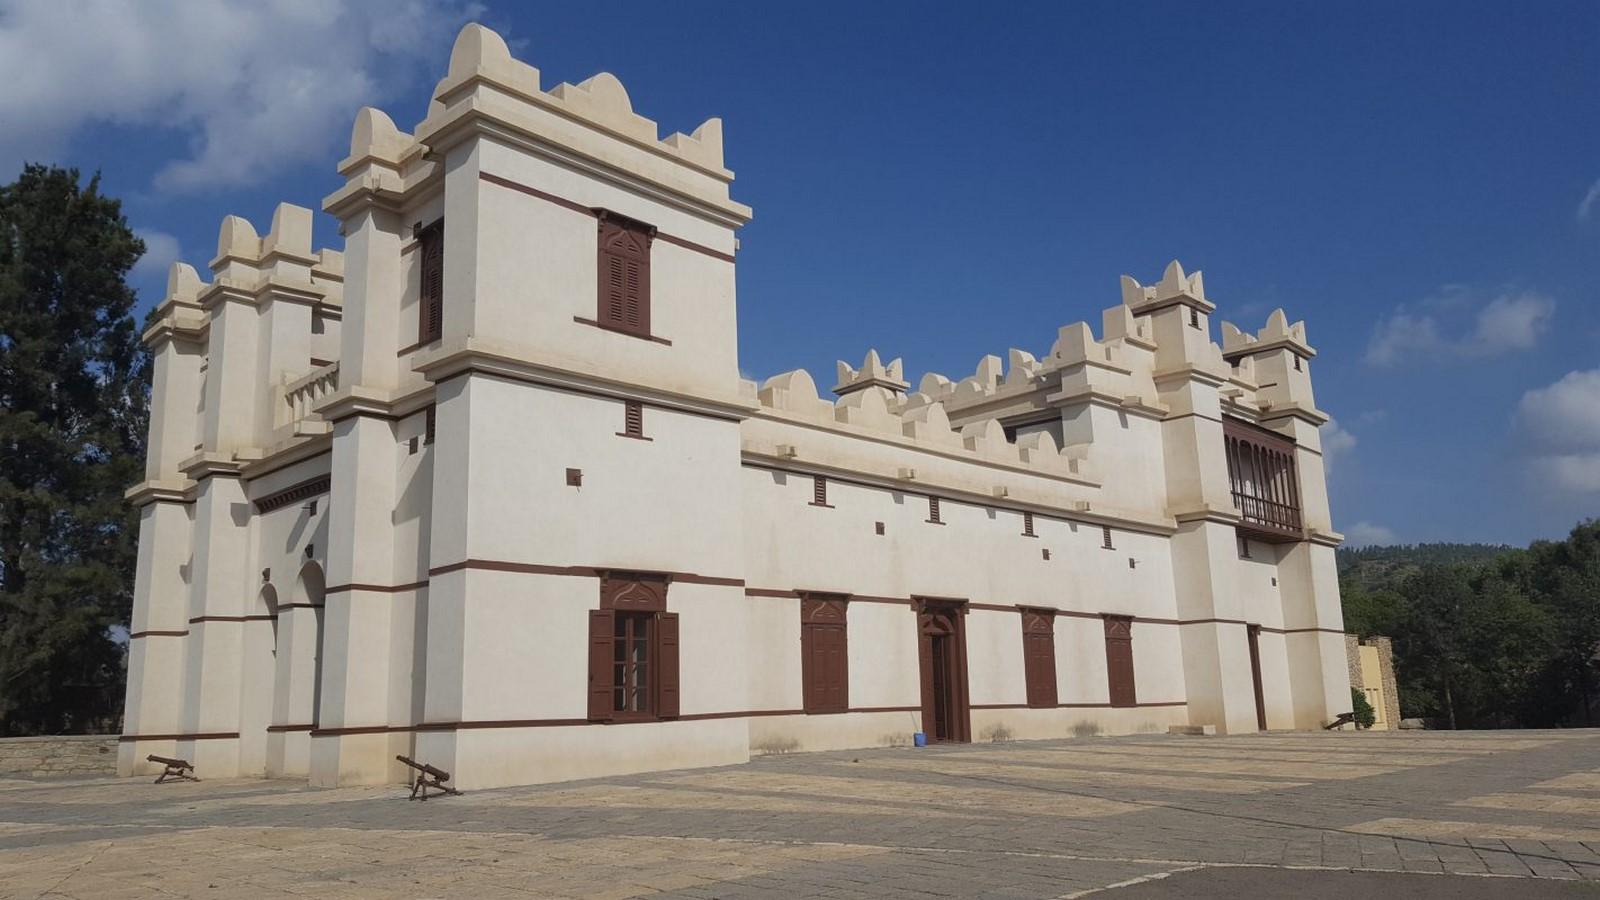 Aksumite architecture: Architecture of Ethiopia - Sheet18